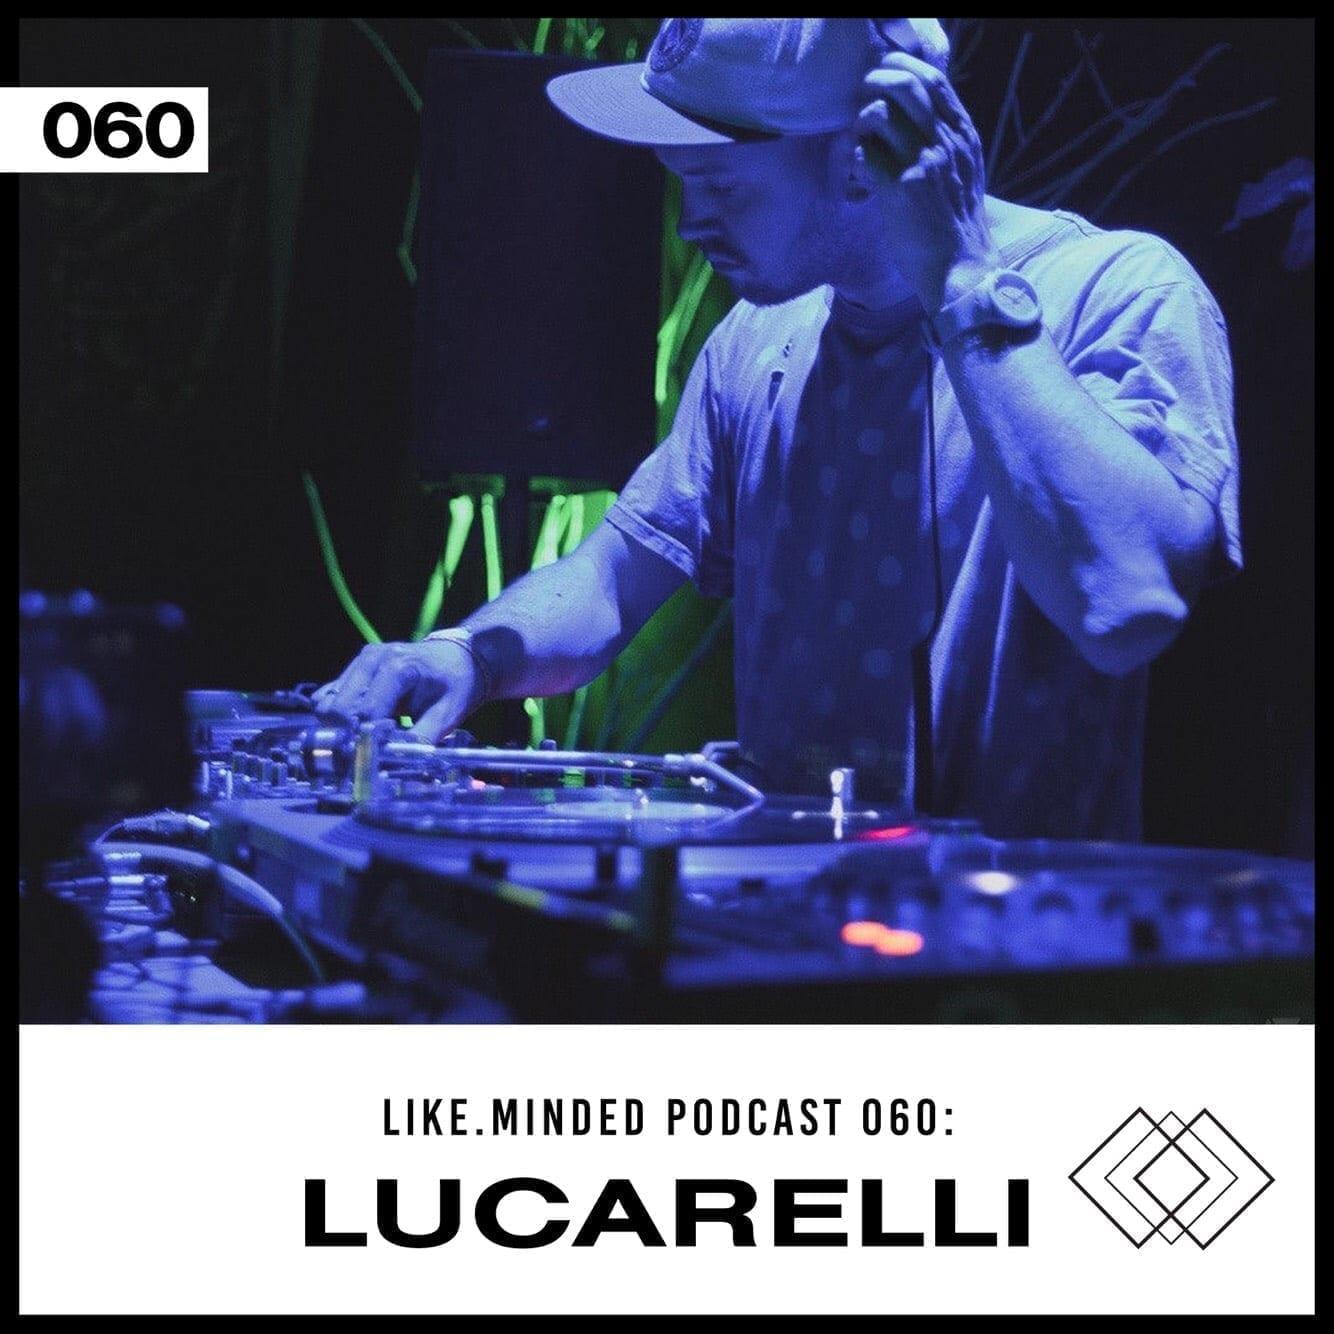 Like.Minded Podcast 060: Lucarelli